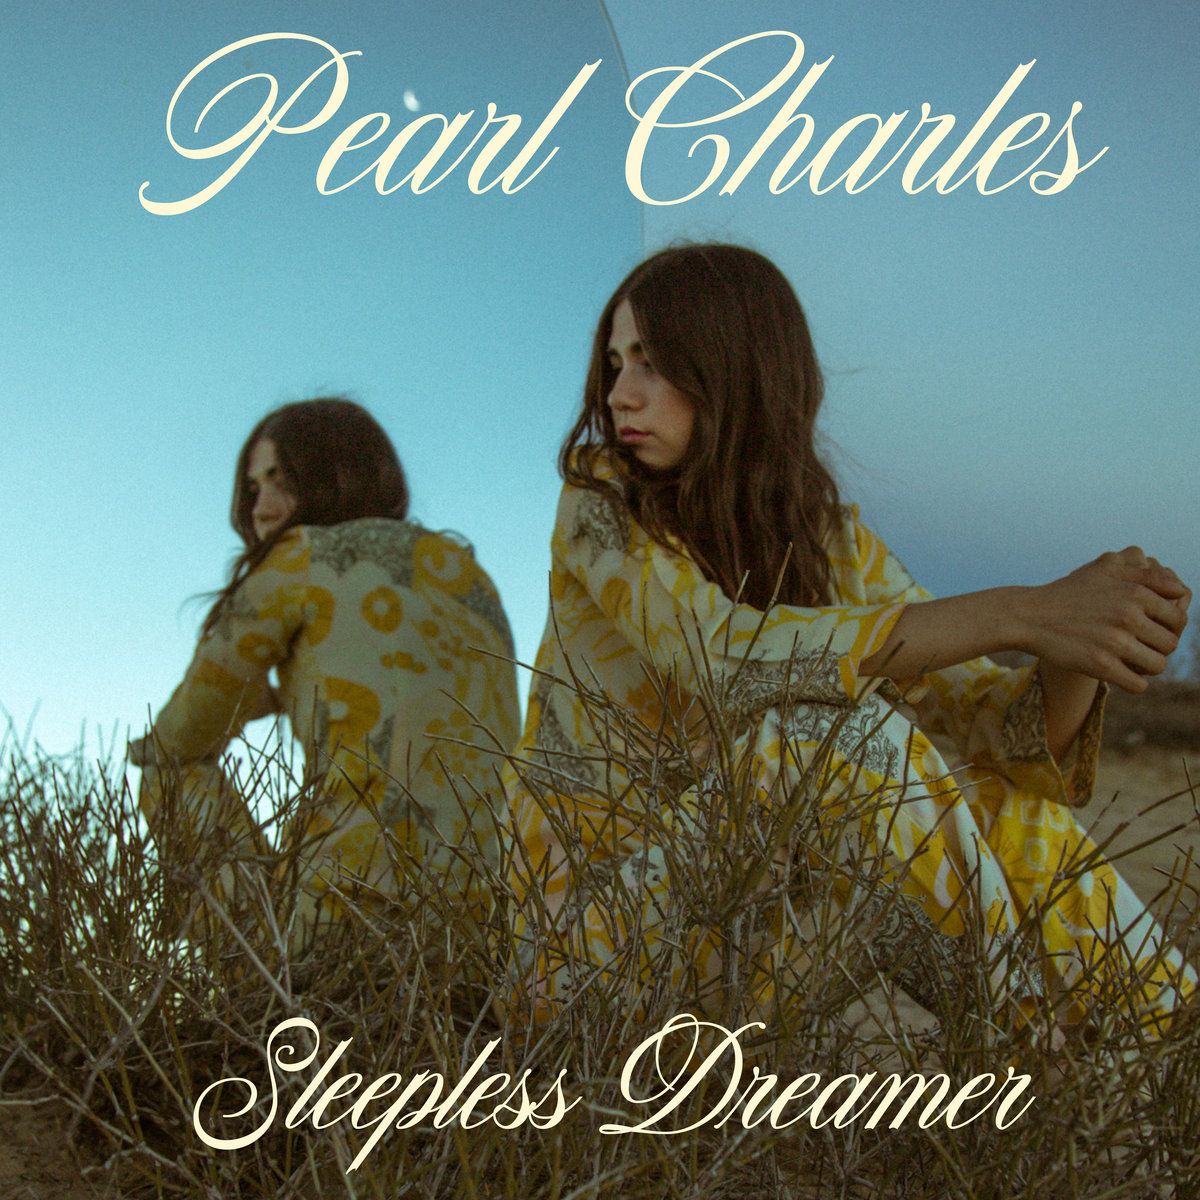 REVIEW: Pearl Charles Sleepless Dreamer